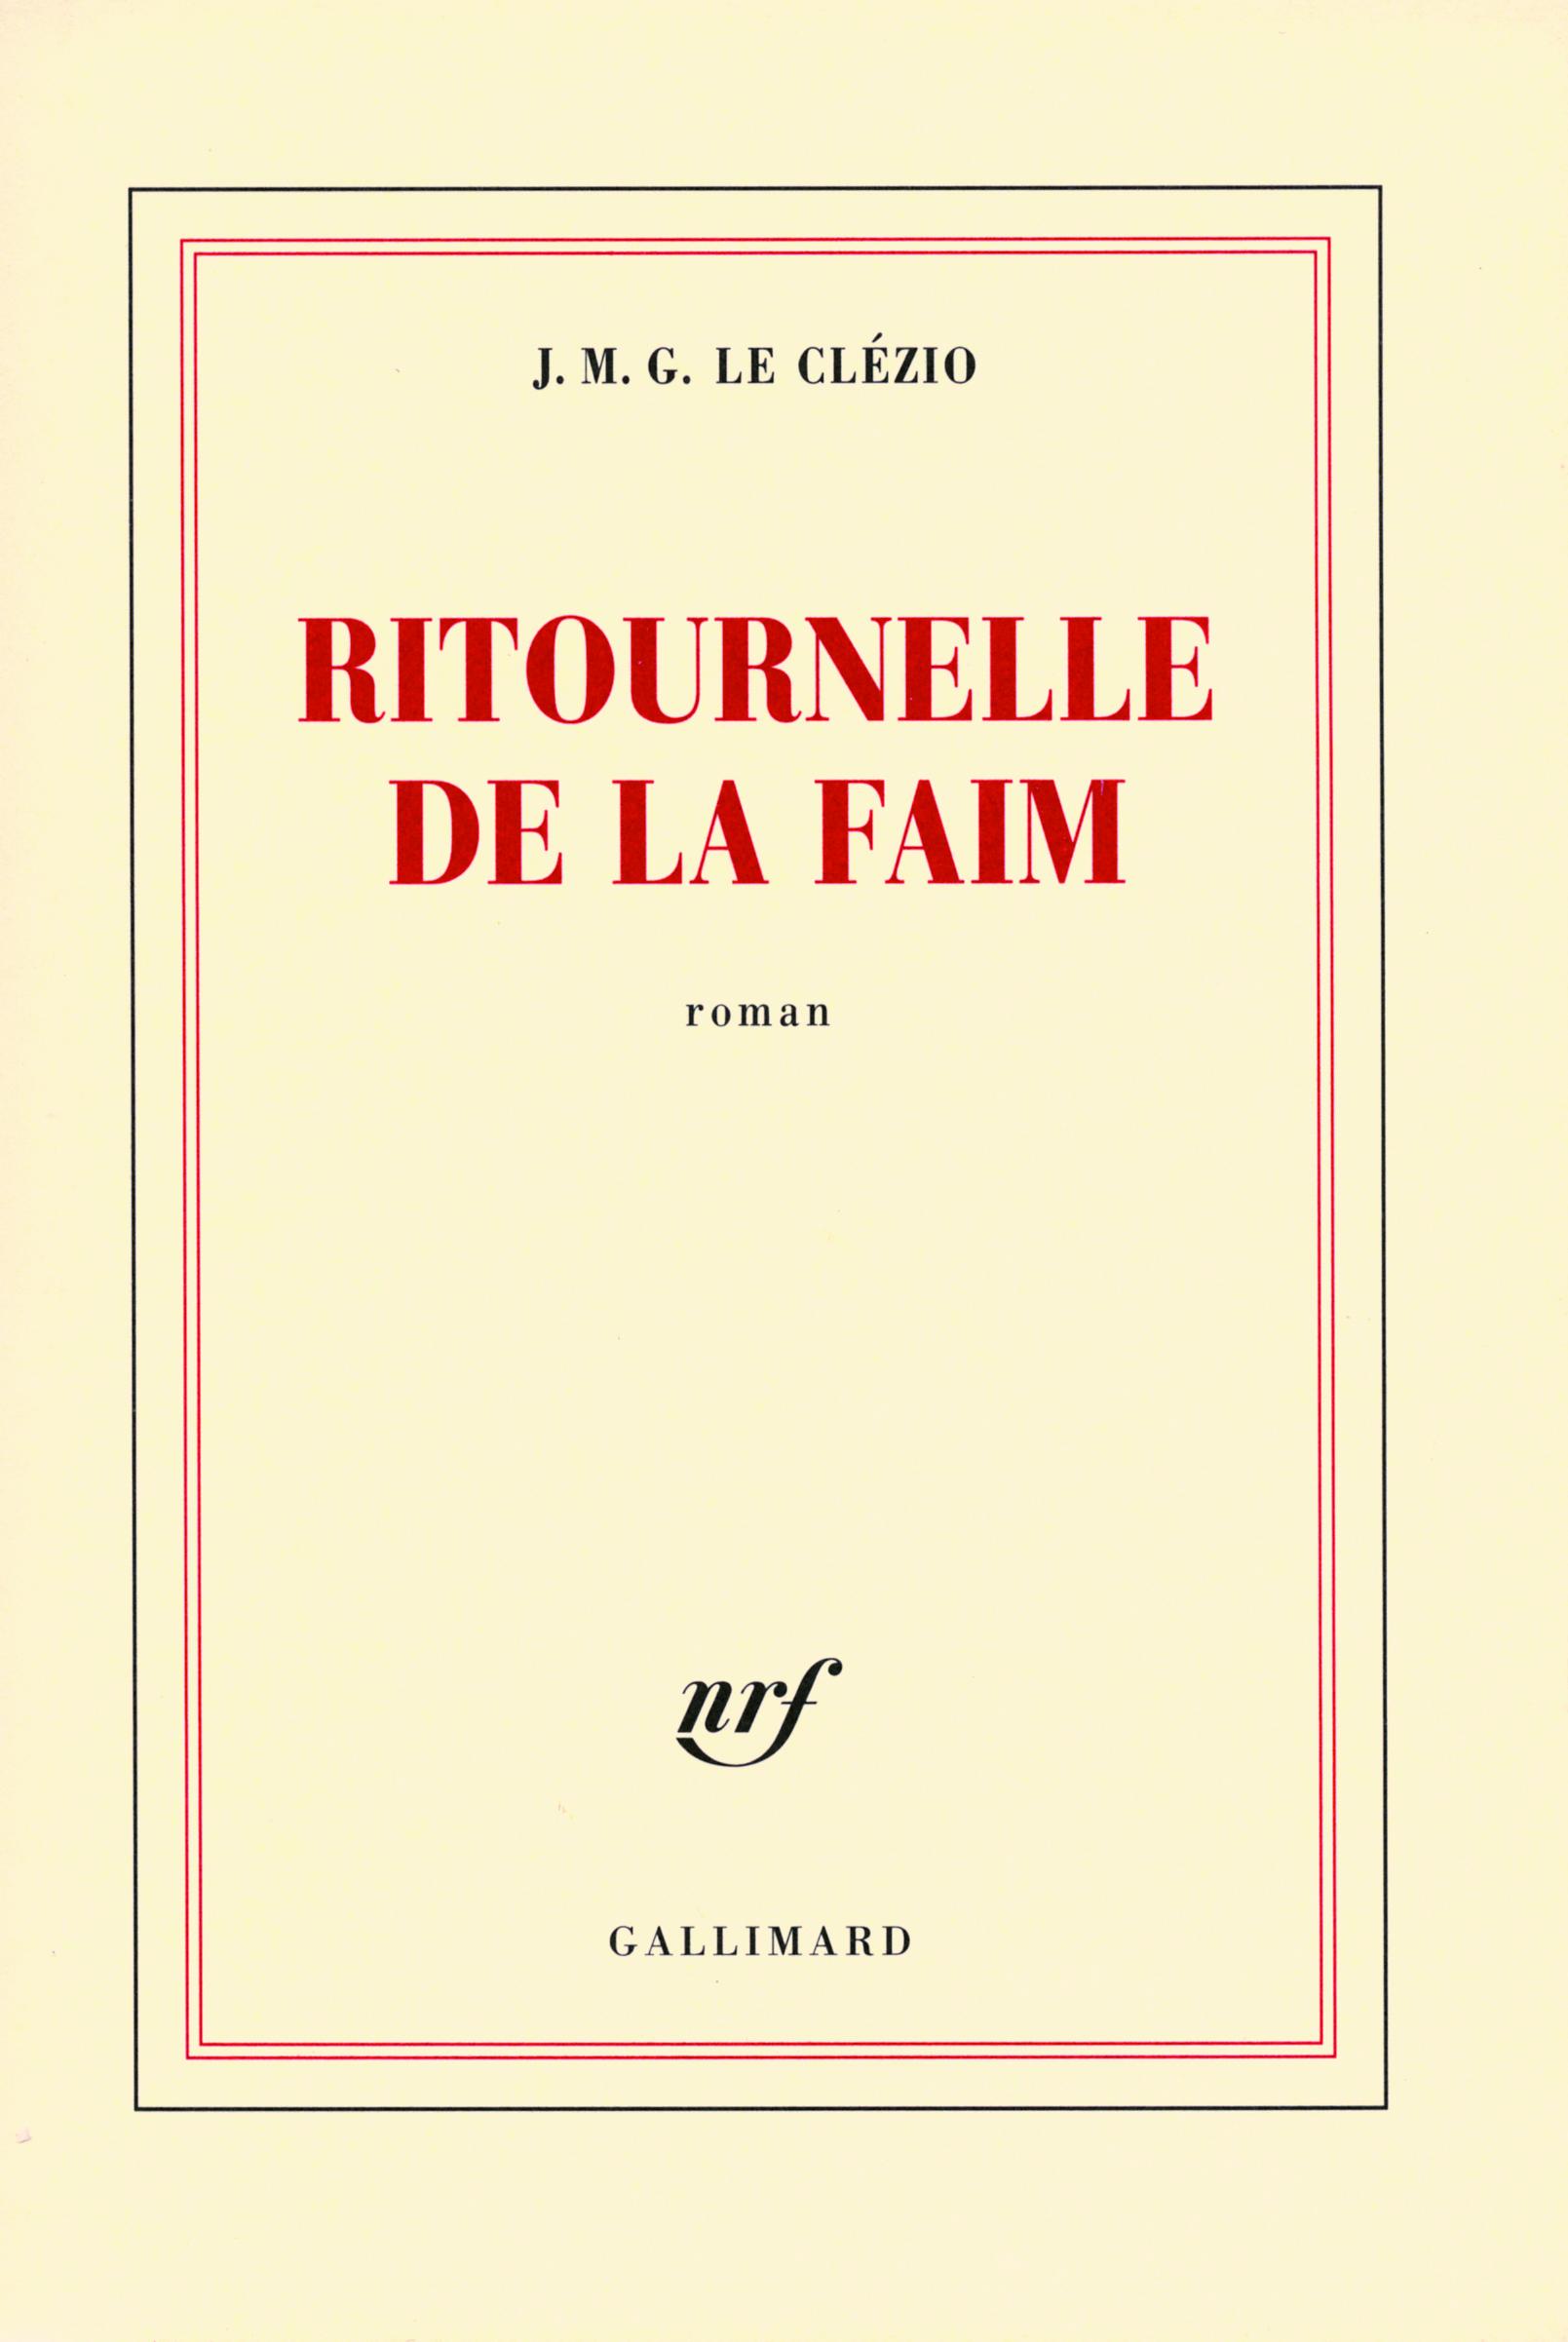 RITOURNELLE DE LA FAIM ROMAN